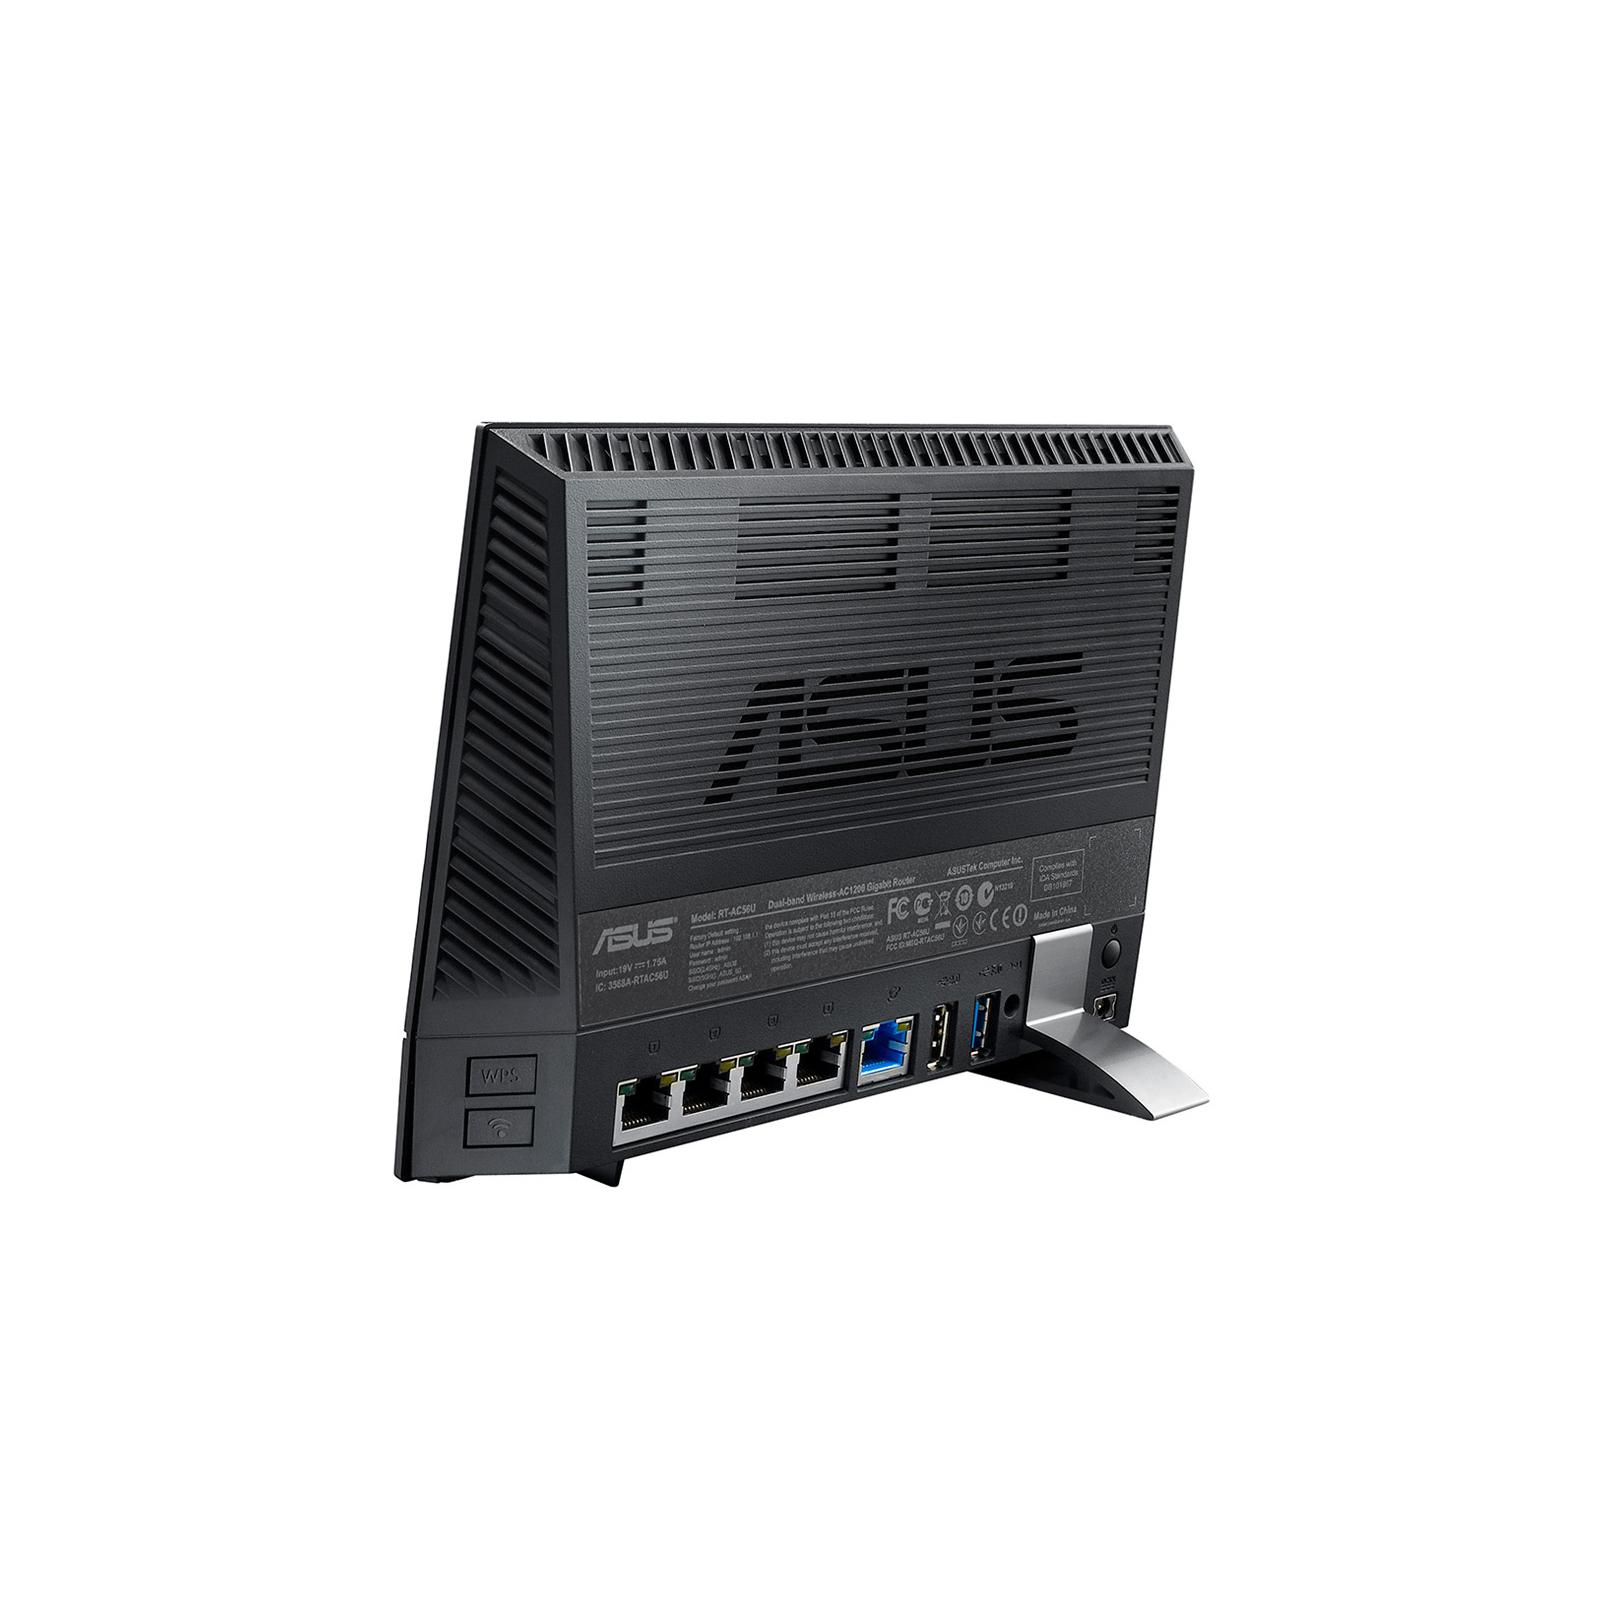 Маршрутизатор ASUS RT-AC56U изображение 5